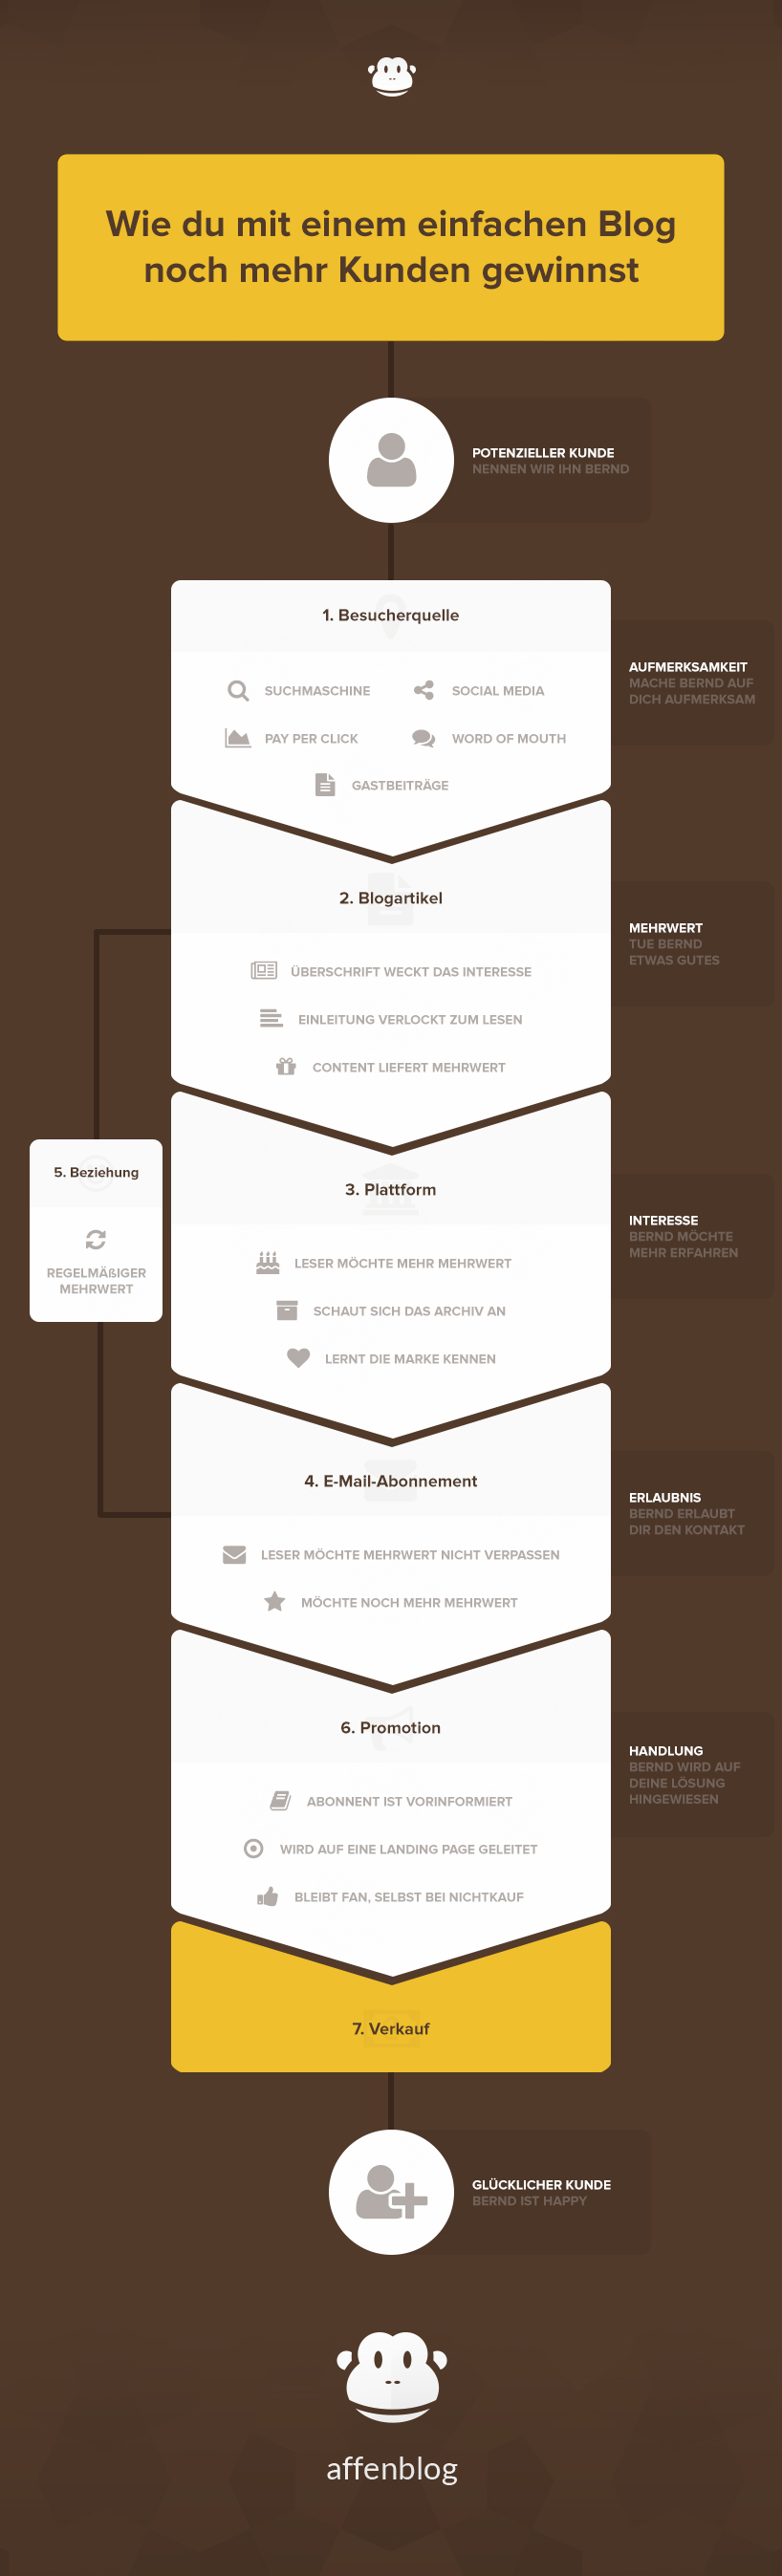 blog-kunden-gewinnen-infografik